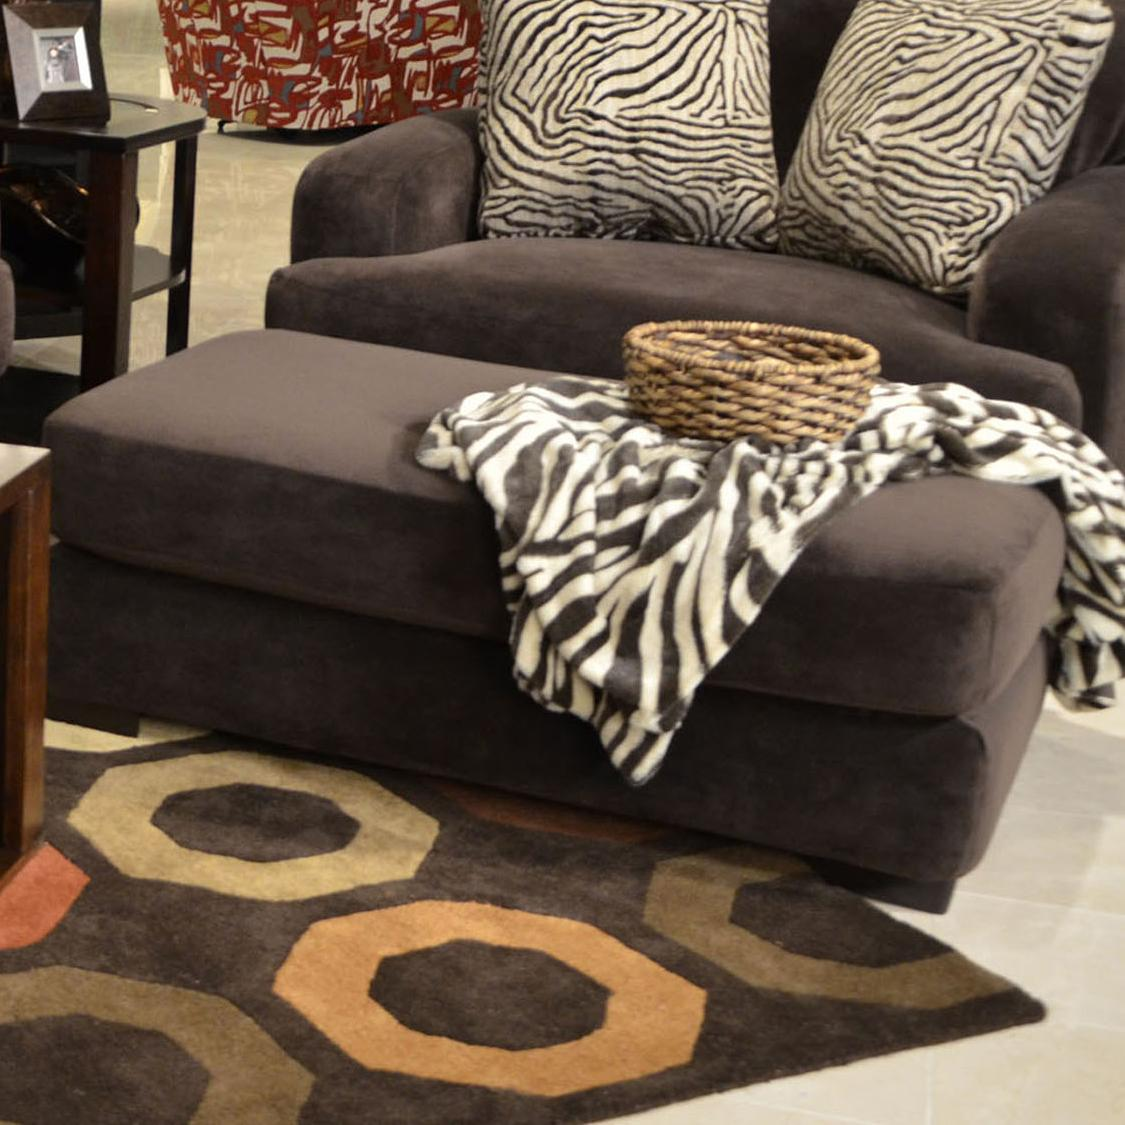 Jackson Furniture Palisades Ottoman   Item Number: 4186 10 Chocolate